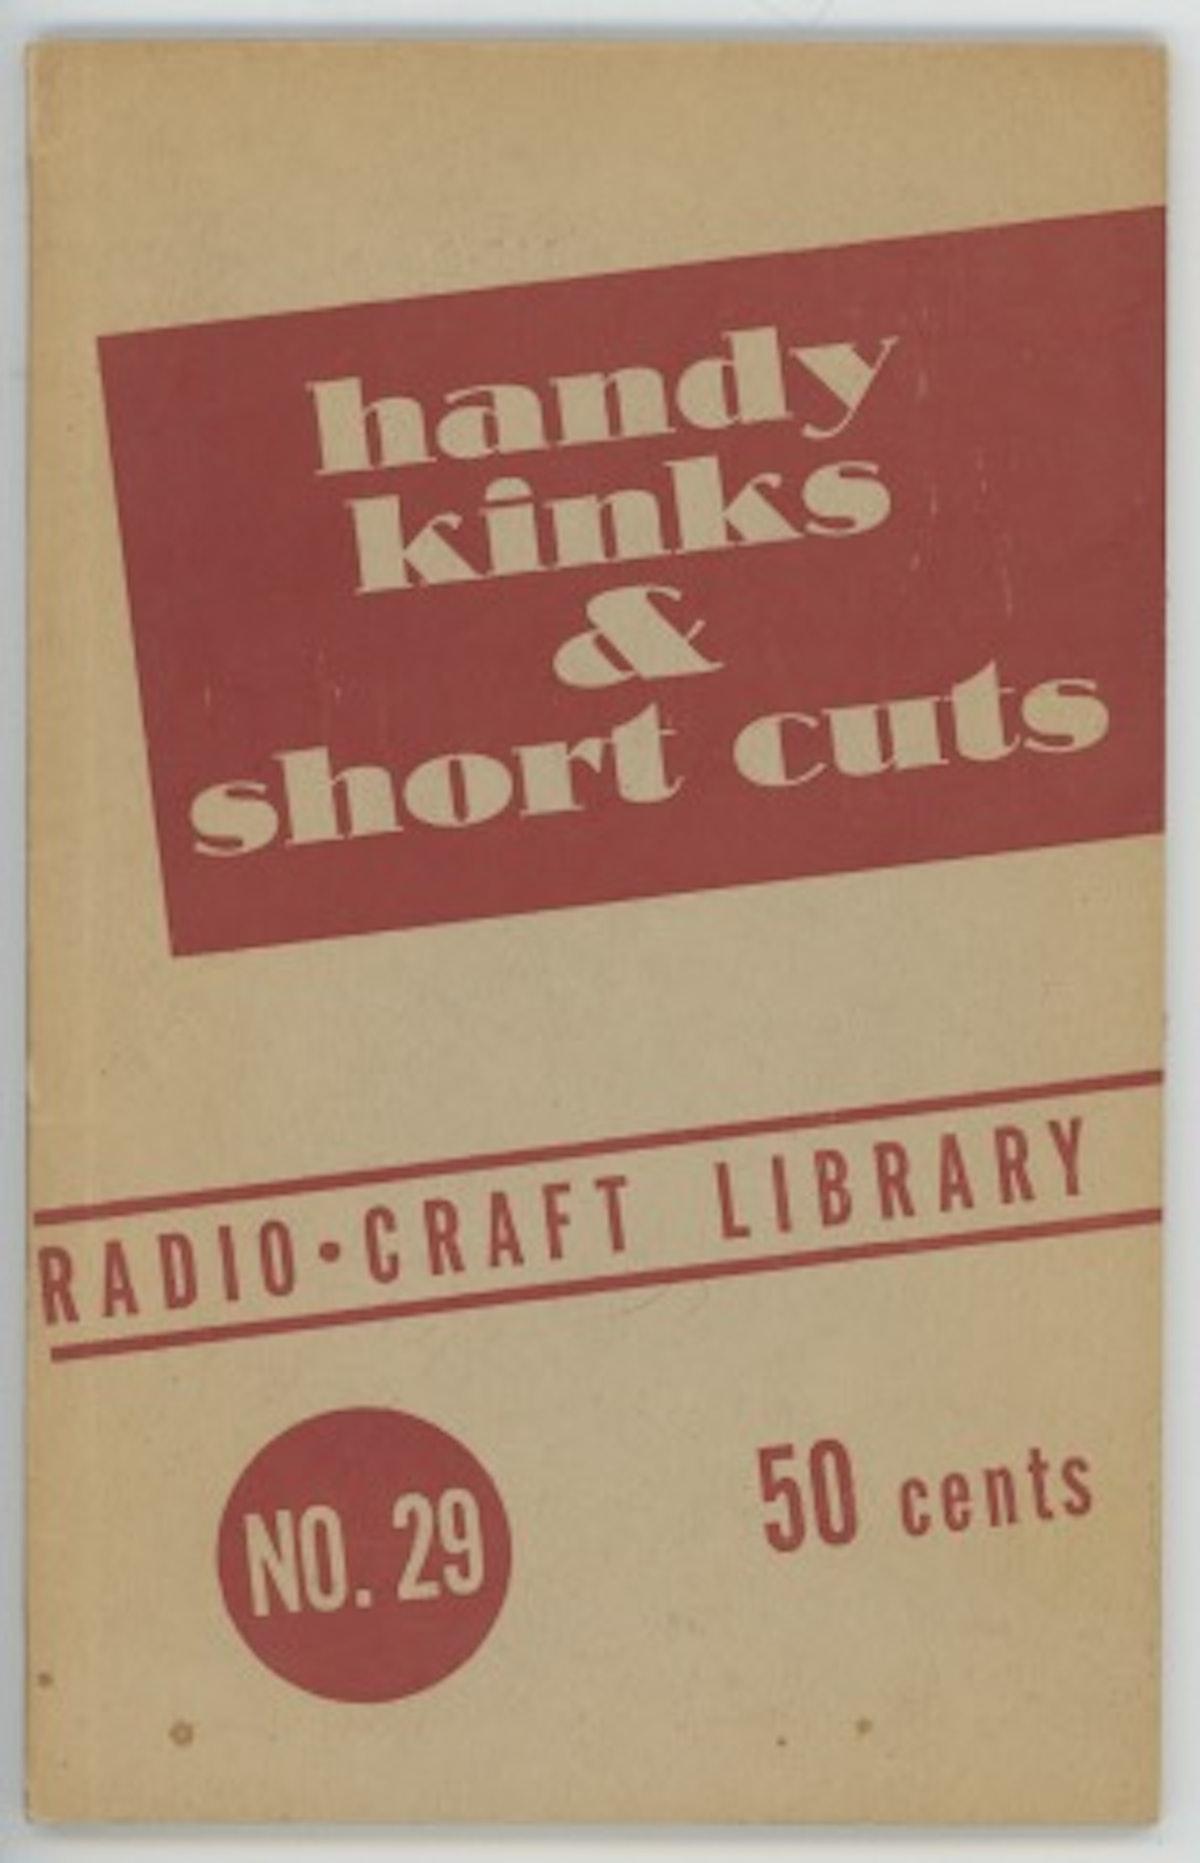 Handy Kinks & Short Cuts